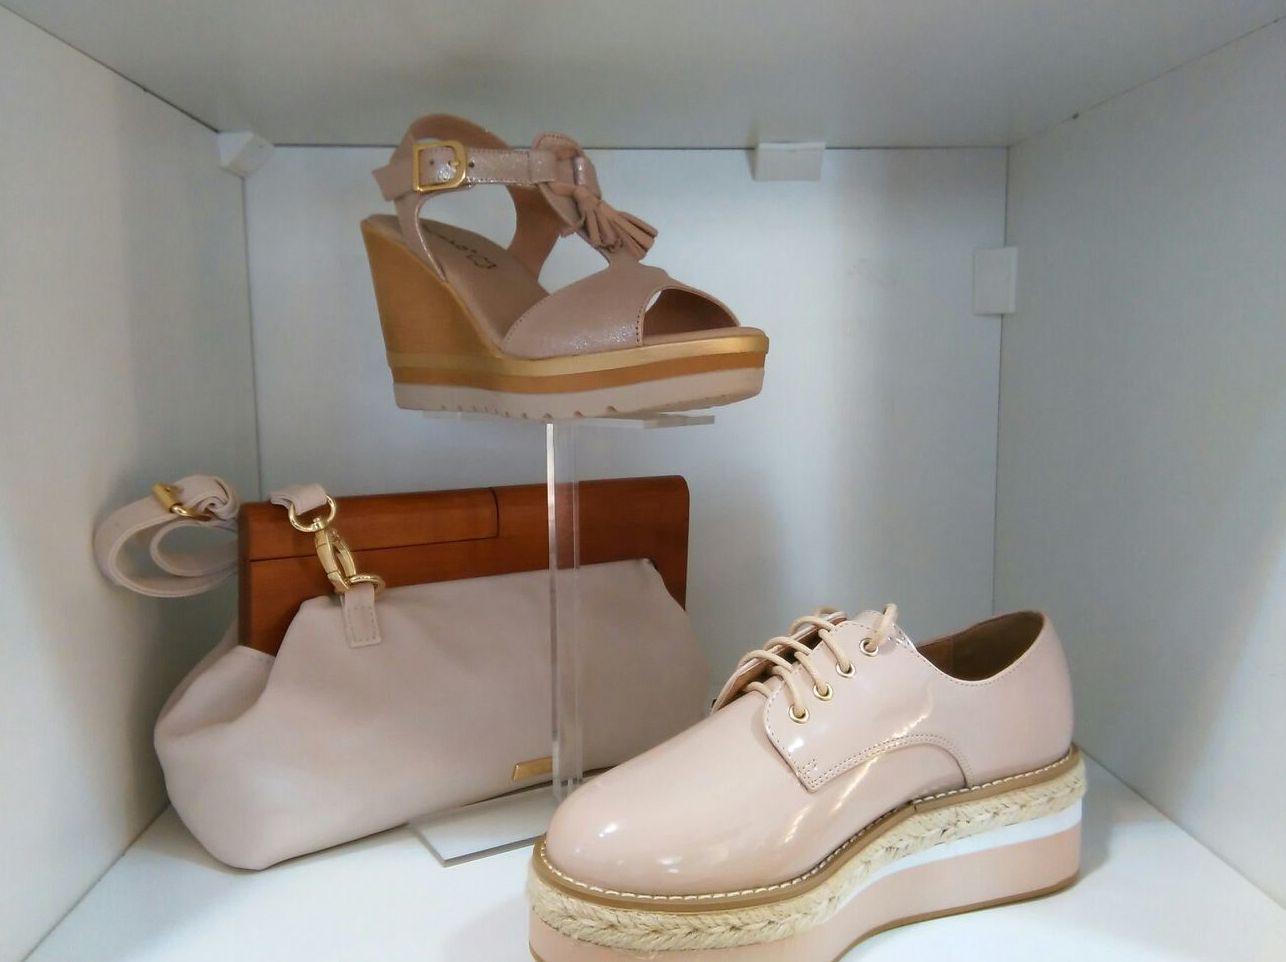 Últimas tendencias en zapatos 2017